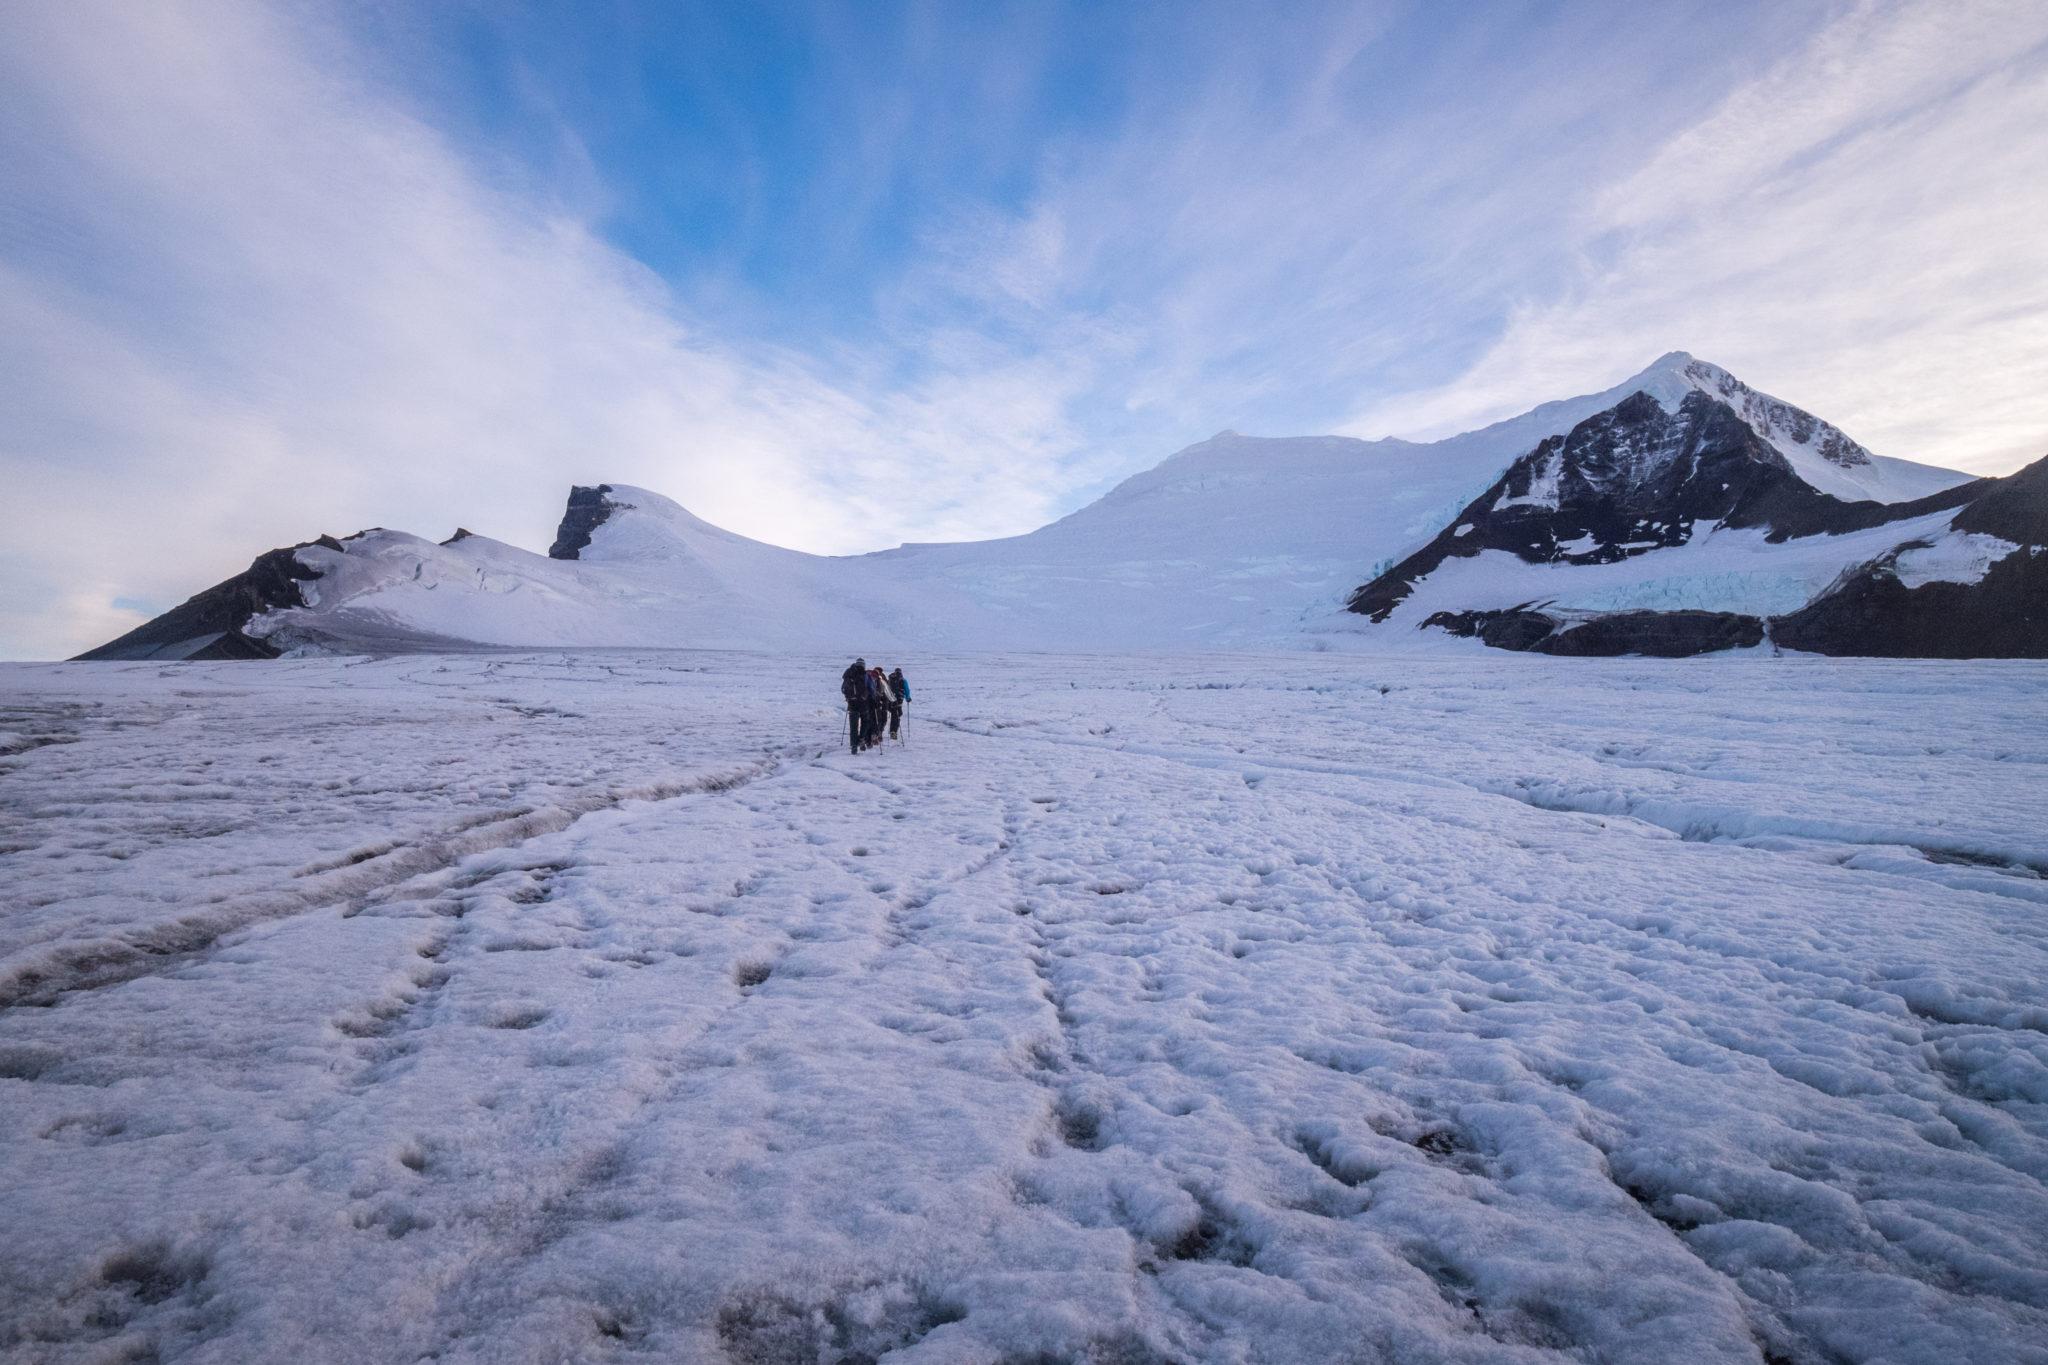 Climb Gorra Blanca Peak: Beginner mountaineering in Patagonia